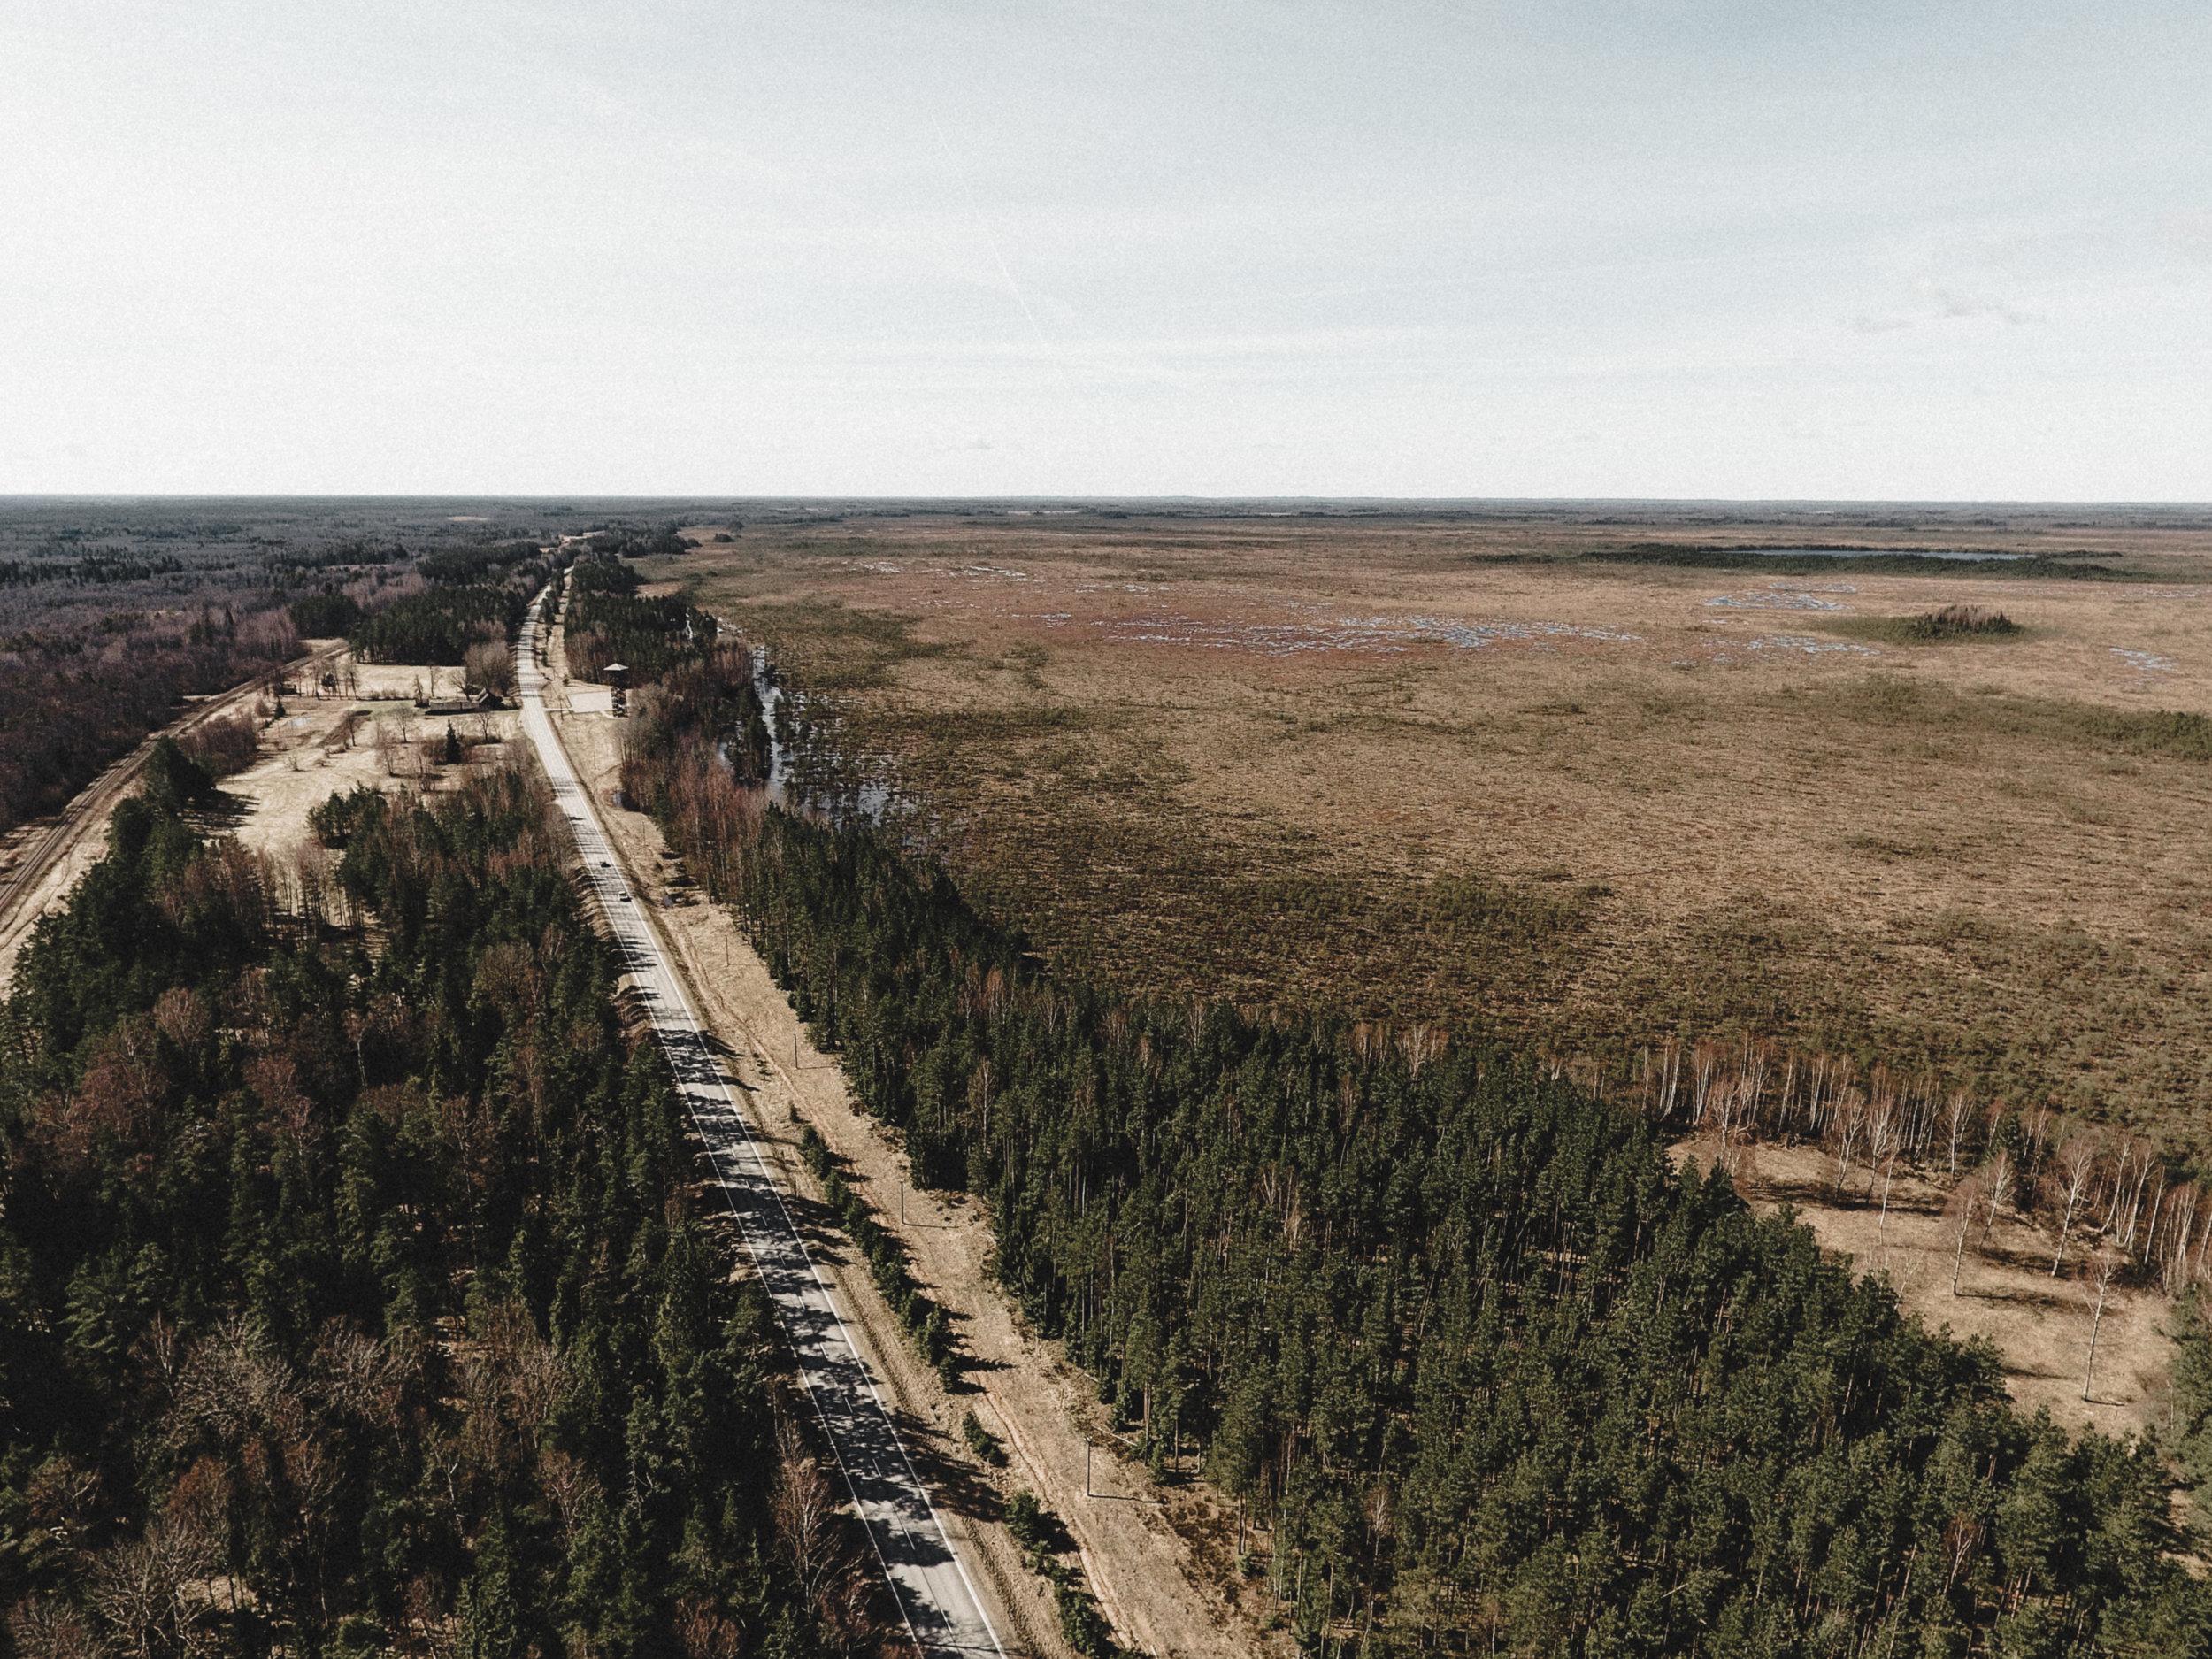 NGWC Latvia Monochrome.jpg